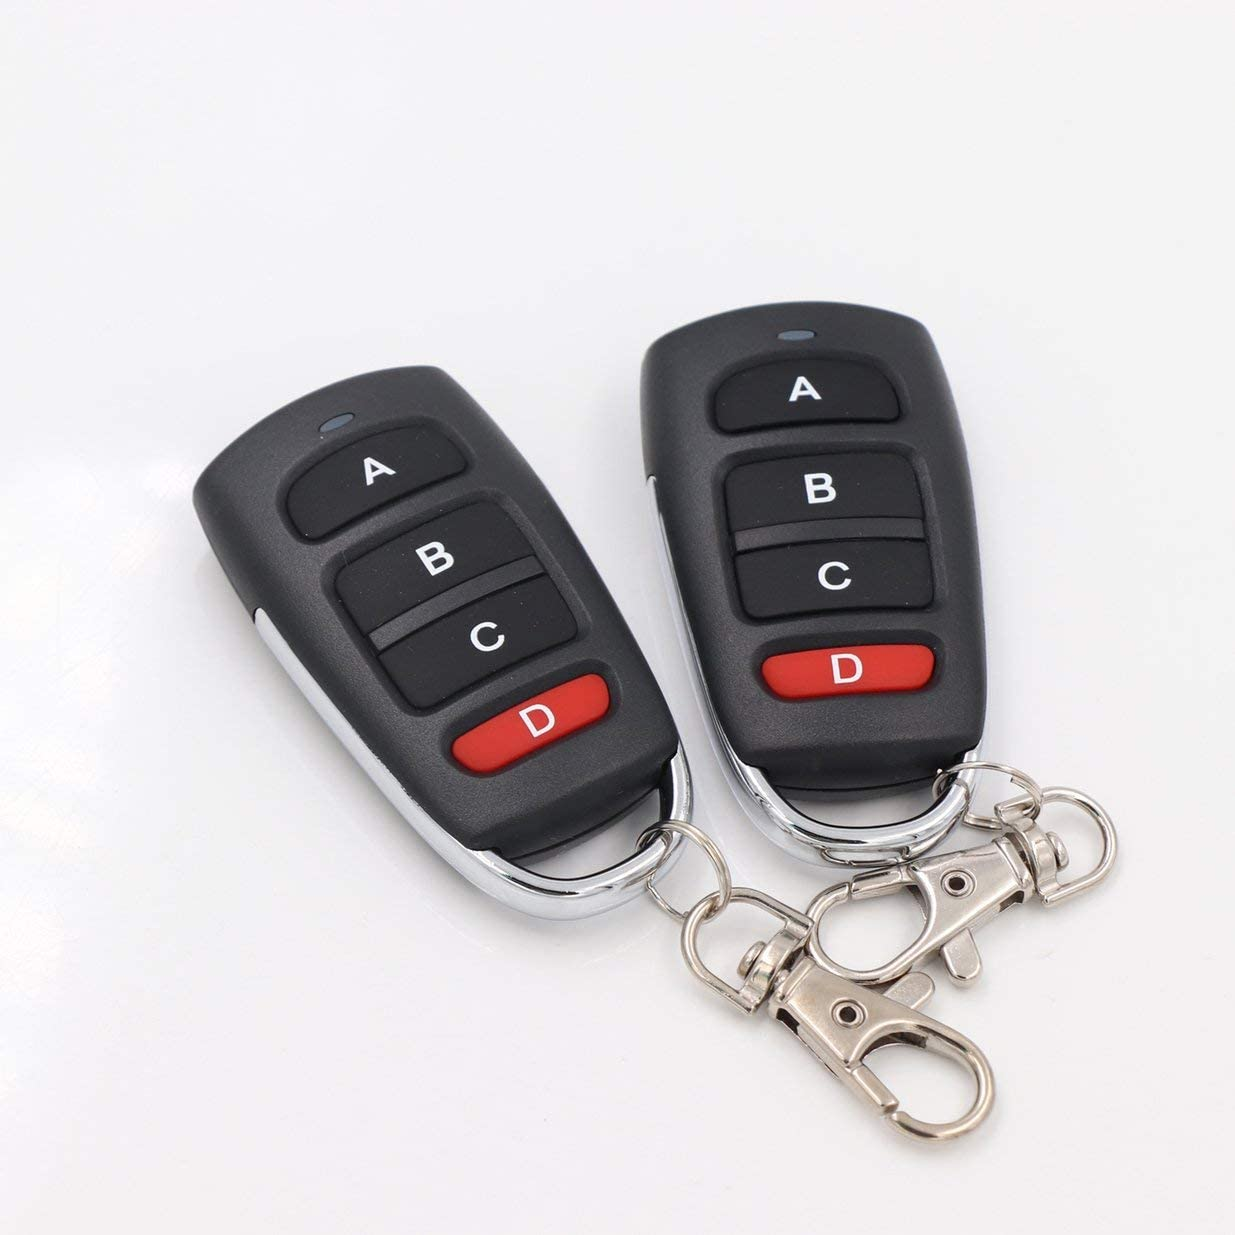 Sairis Copy mando a distancia 433,92 MHz Cloning Duplicator Wireless 4 llaves universal impermeable mango garaje puerta el/éctrica llave negro